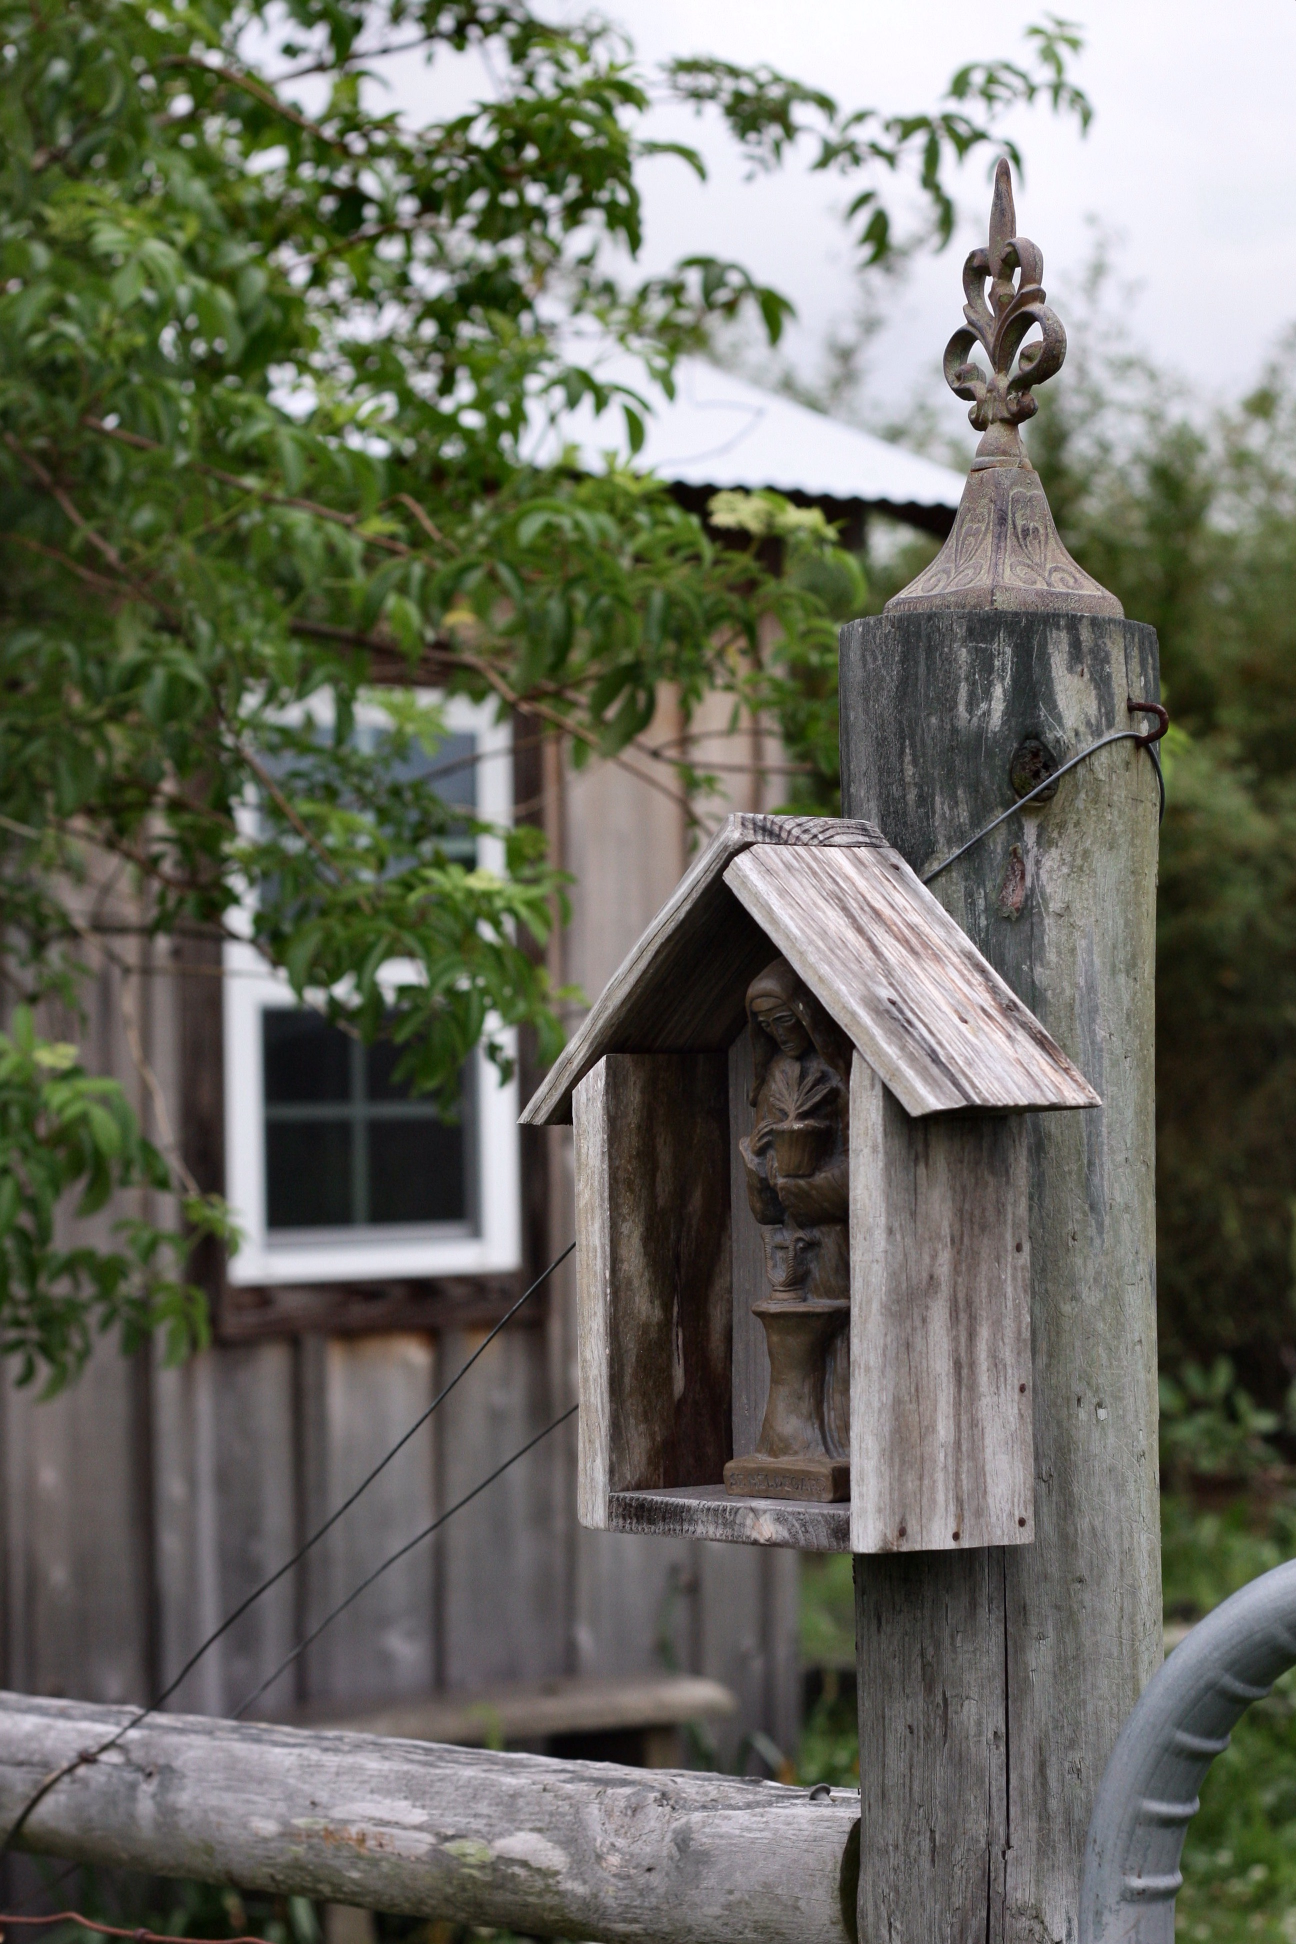 Saint Hildegard & Garden Shed